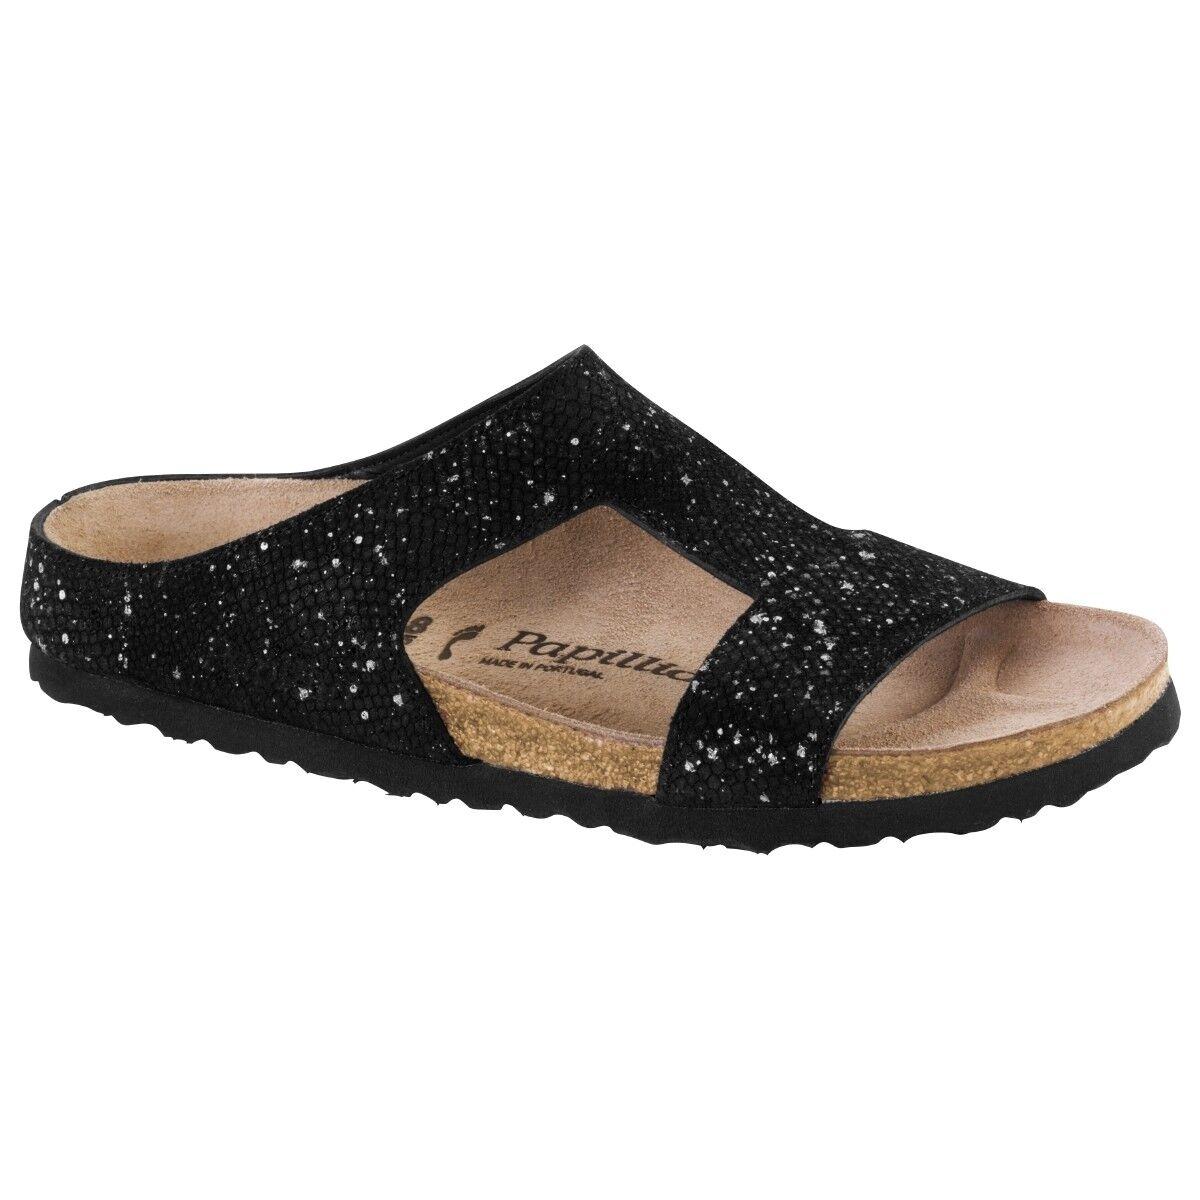 Birkenstock Papillio charlize gamuza zapatos de piel ancho sandalia estrecho 1007318